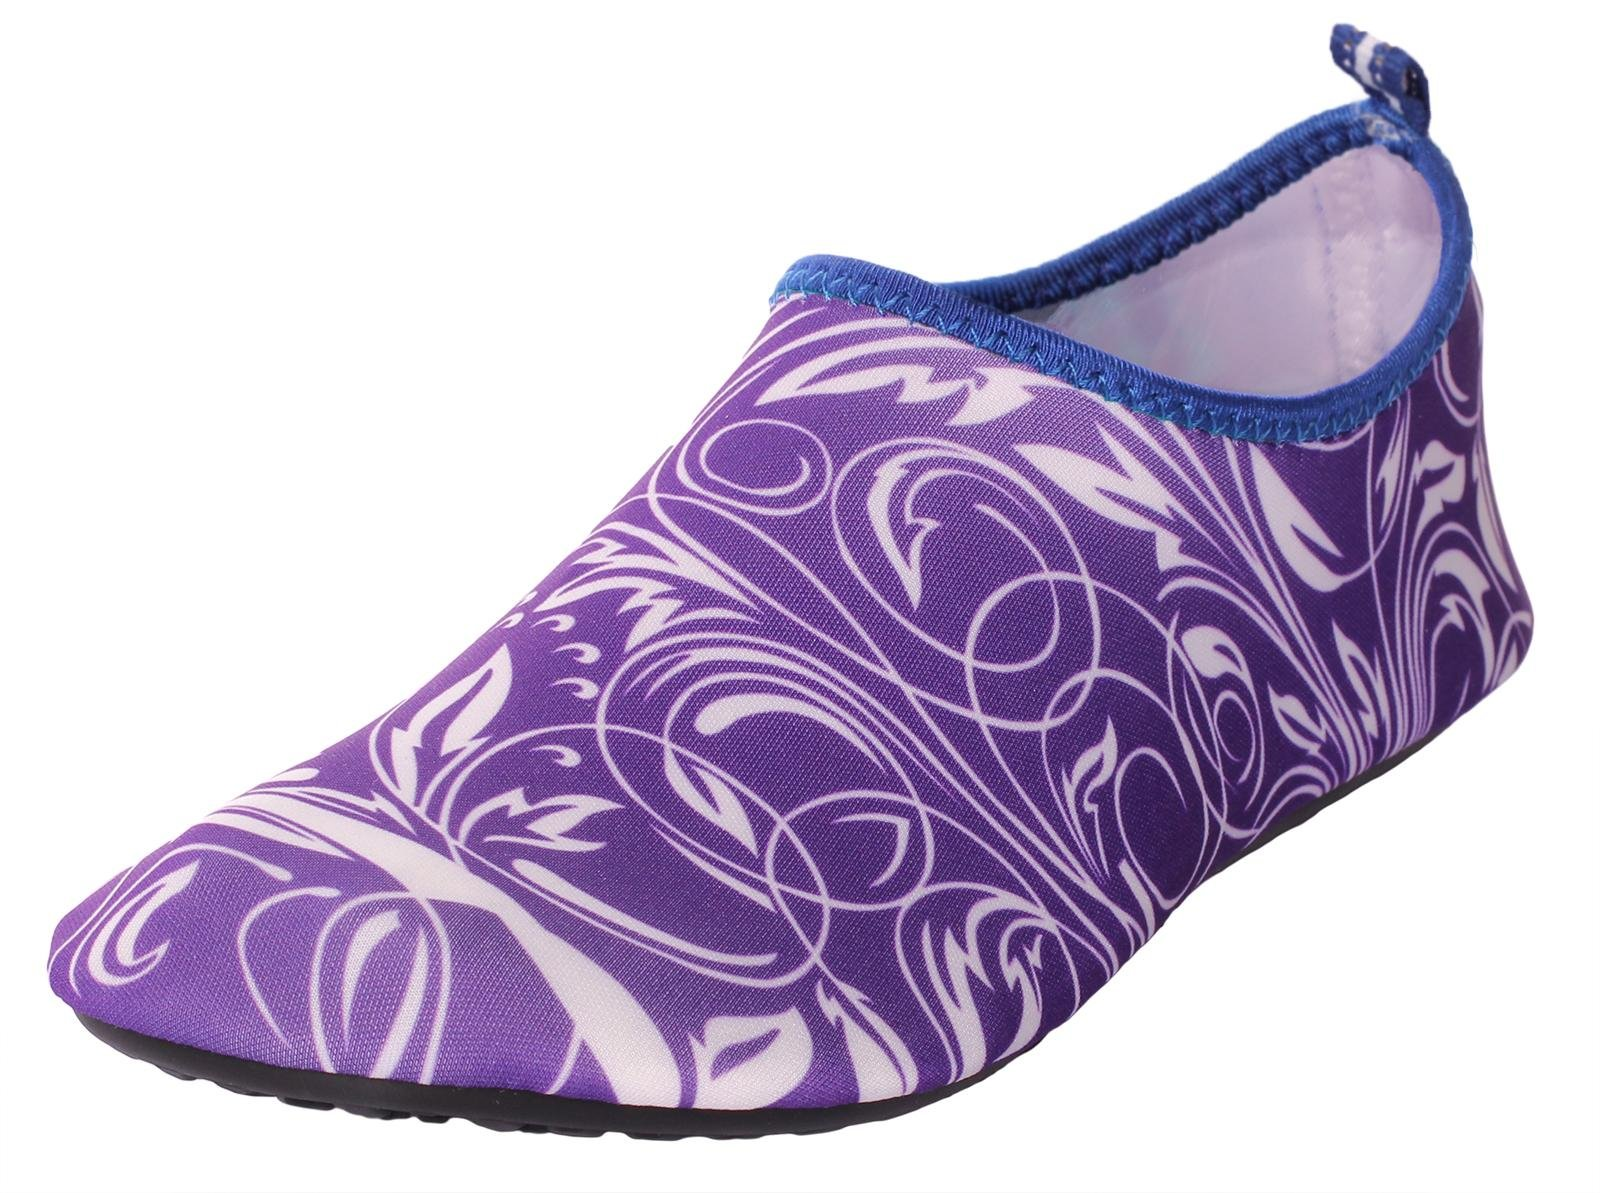 CAIHEE Women's and Men's Lightweight Quick Dry Slip On Water Shoes Aqua Barefoot Skin Shoes (6-7 B(M)US Women/6-6.5 D(M)US Men, Purple)